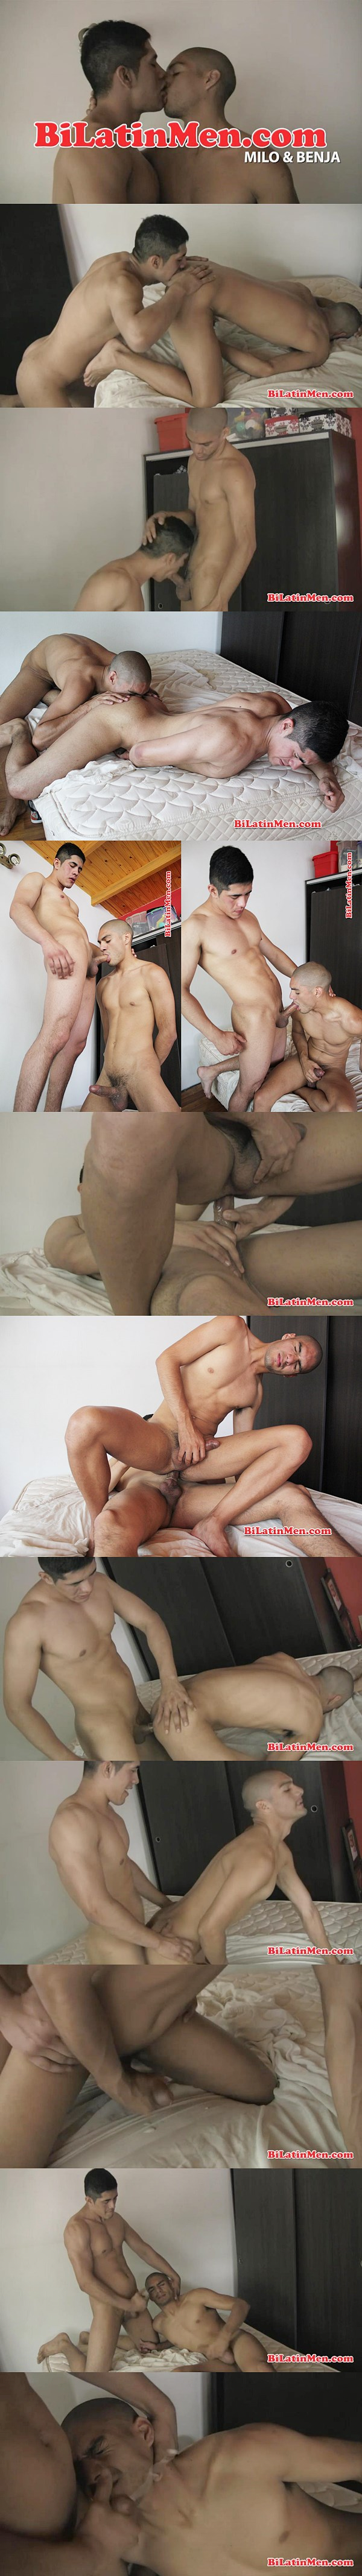 Muscle jock Milo fucks a creamy load out of big-dicked Benja at Bilatinmen